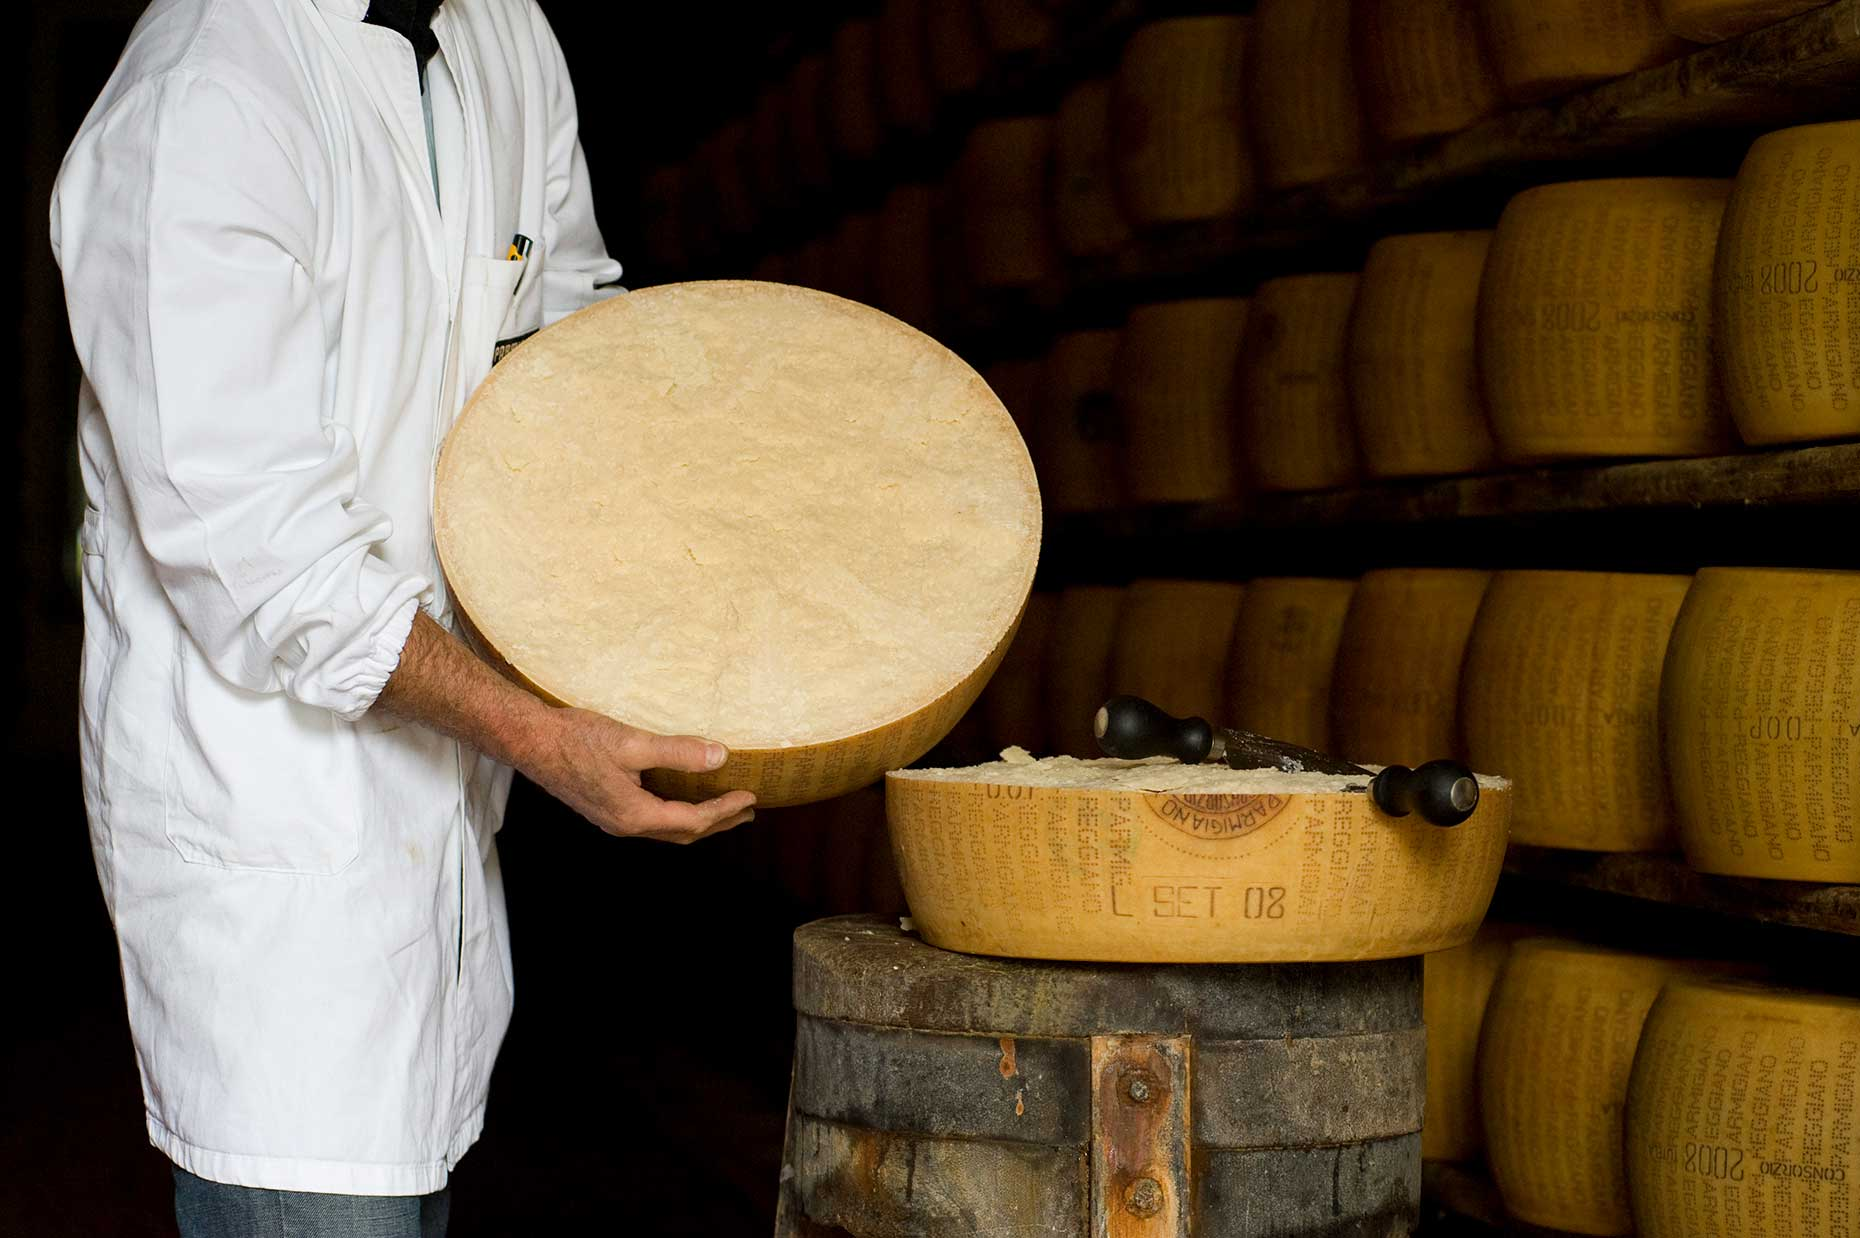 Wheel of Parmesan (Image: Courtesy of Consortium of Parmigiano Reggiano)